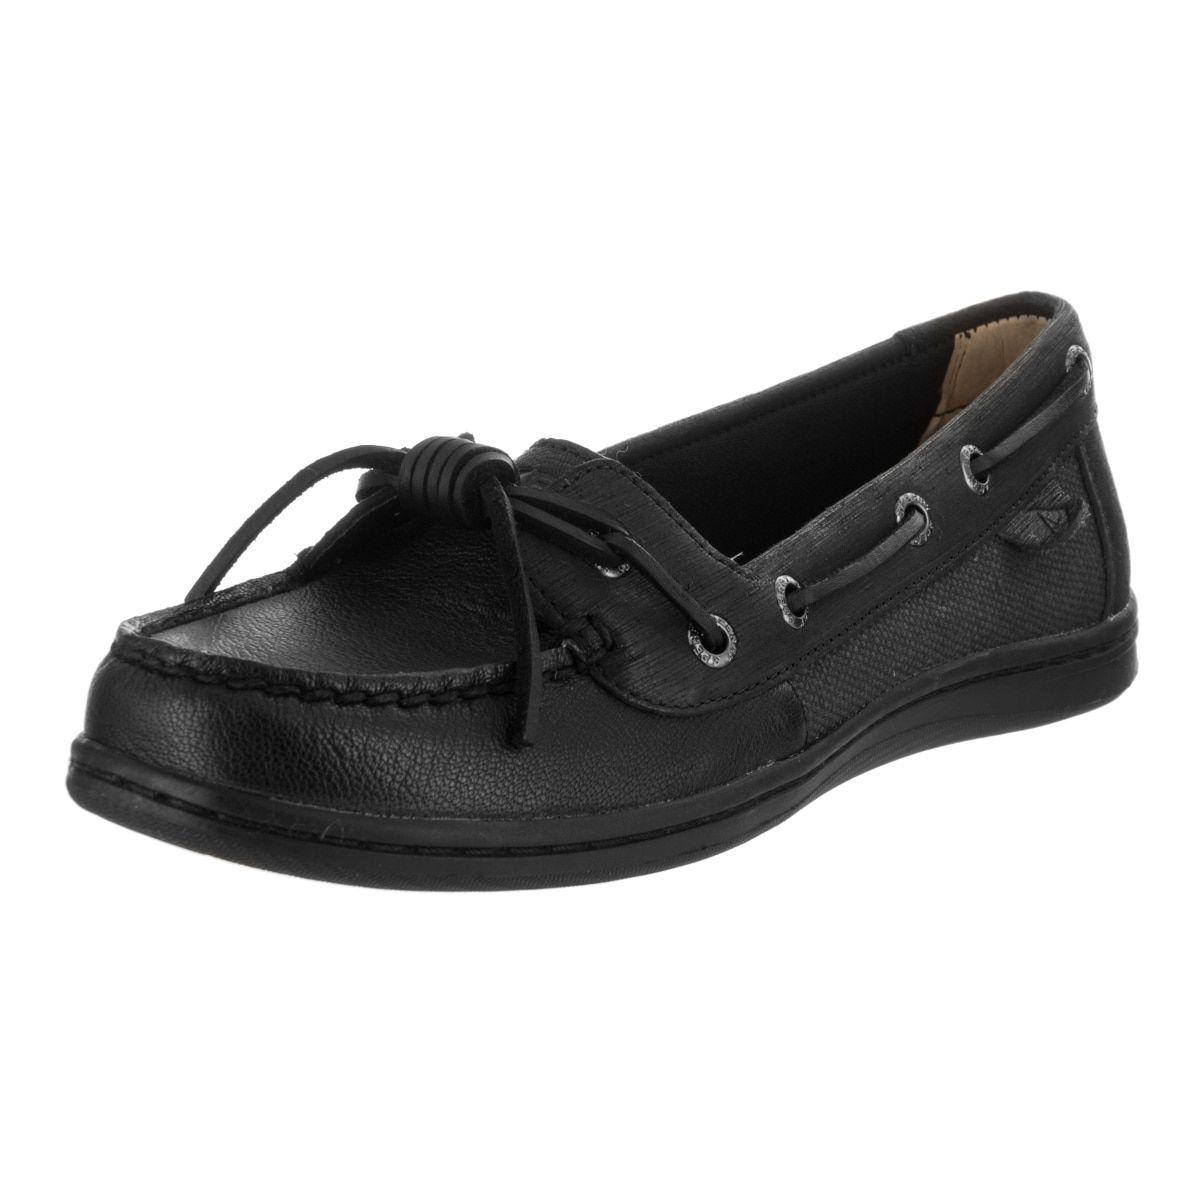 Sperry Top-Sider Women's Barrelfish Boat Shoe, Black - 6.5 B(M) US